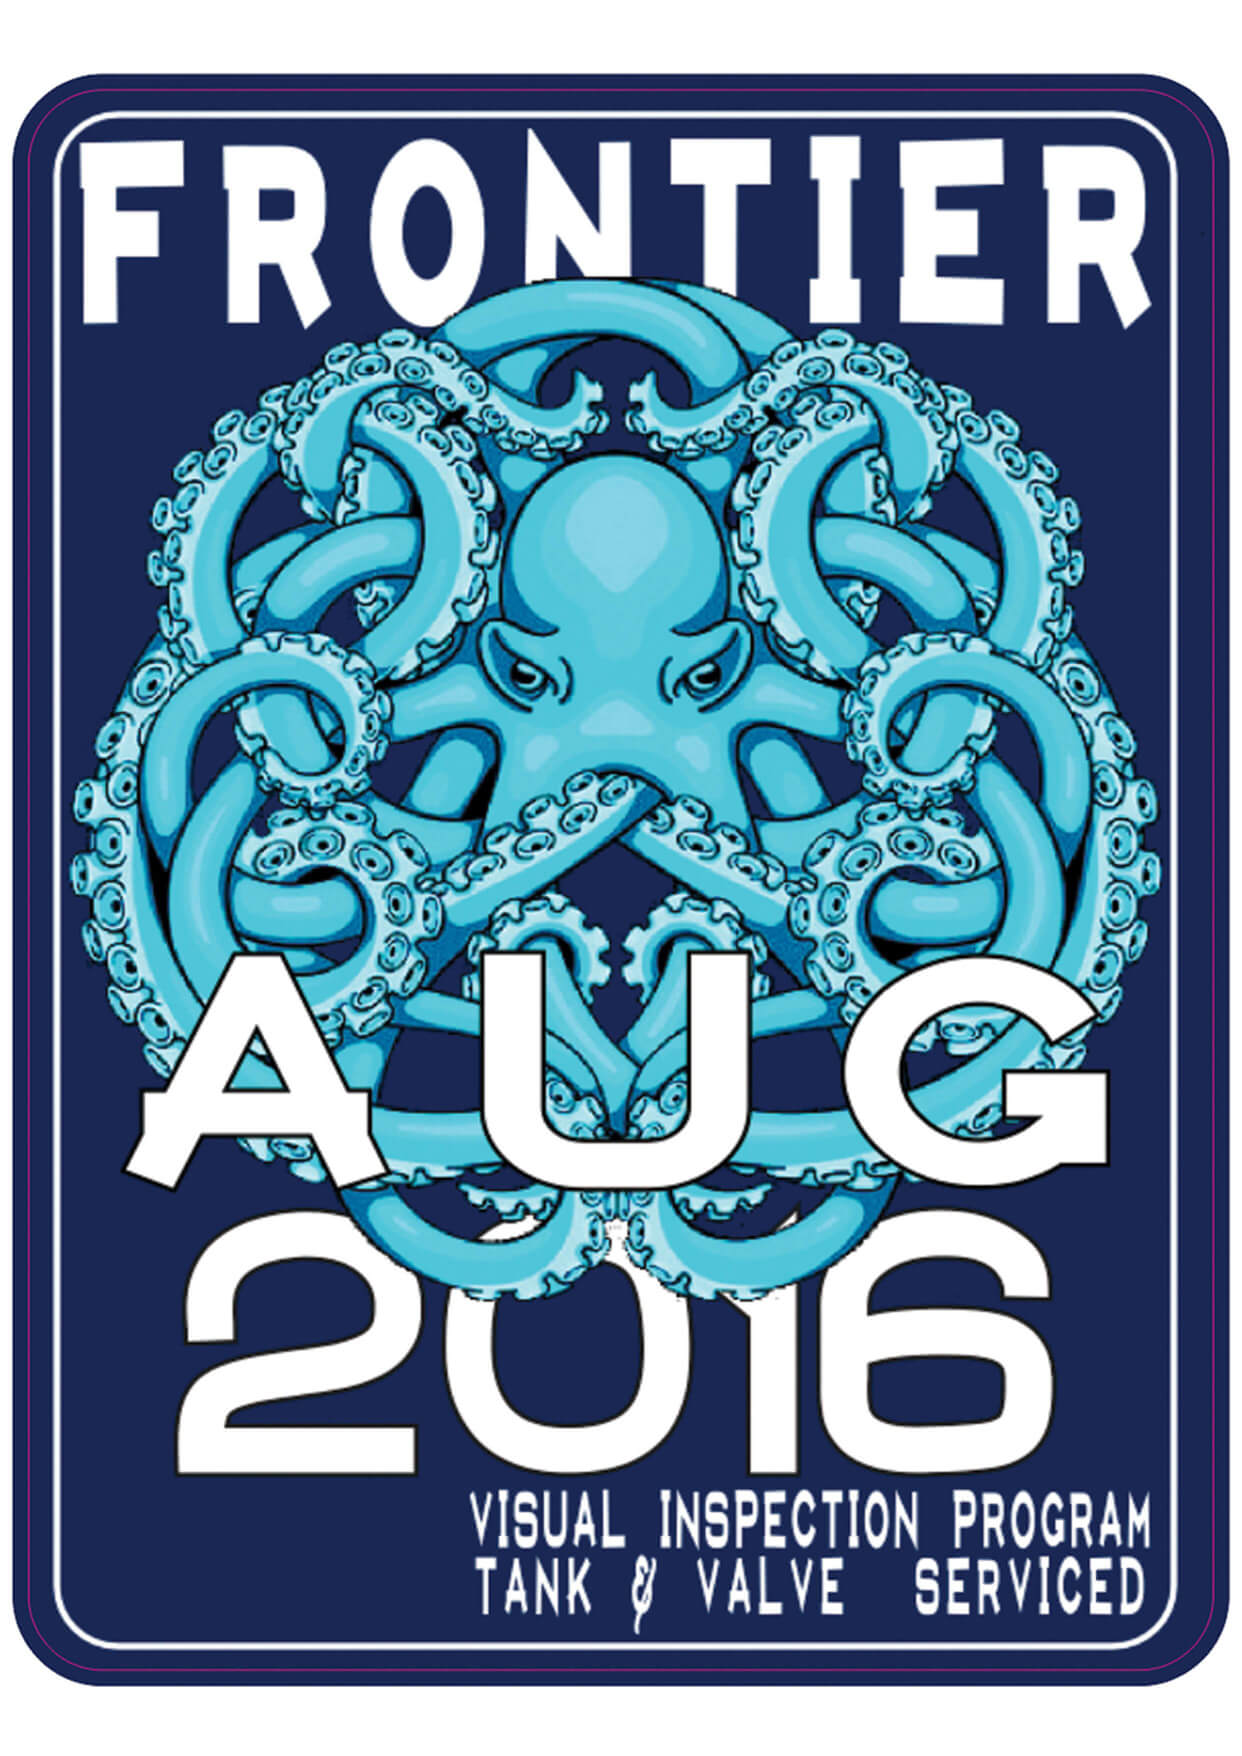 Frontier Scuba